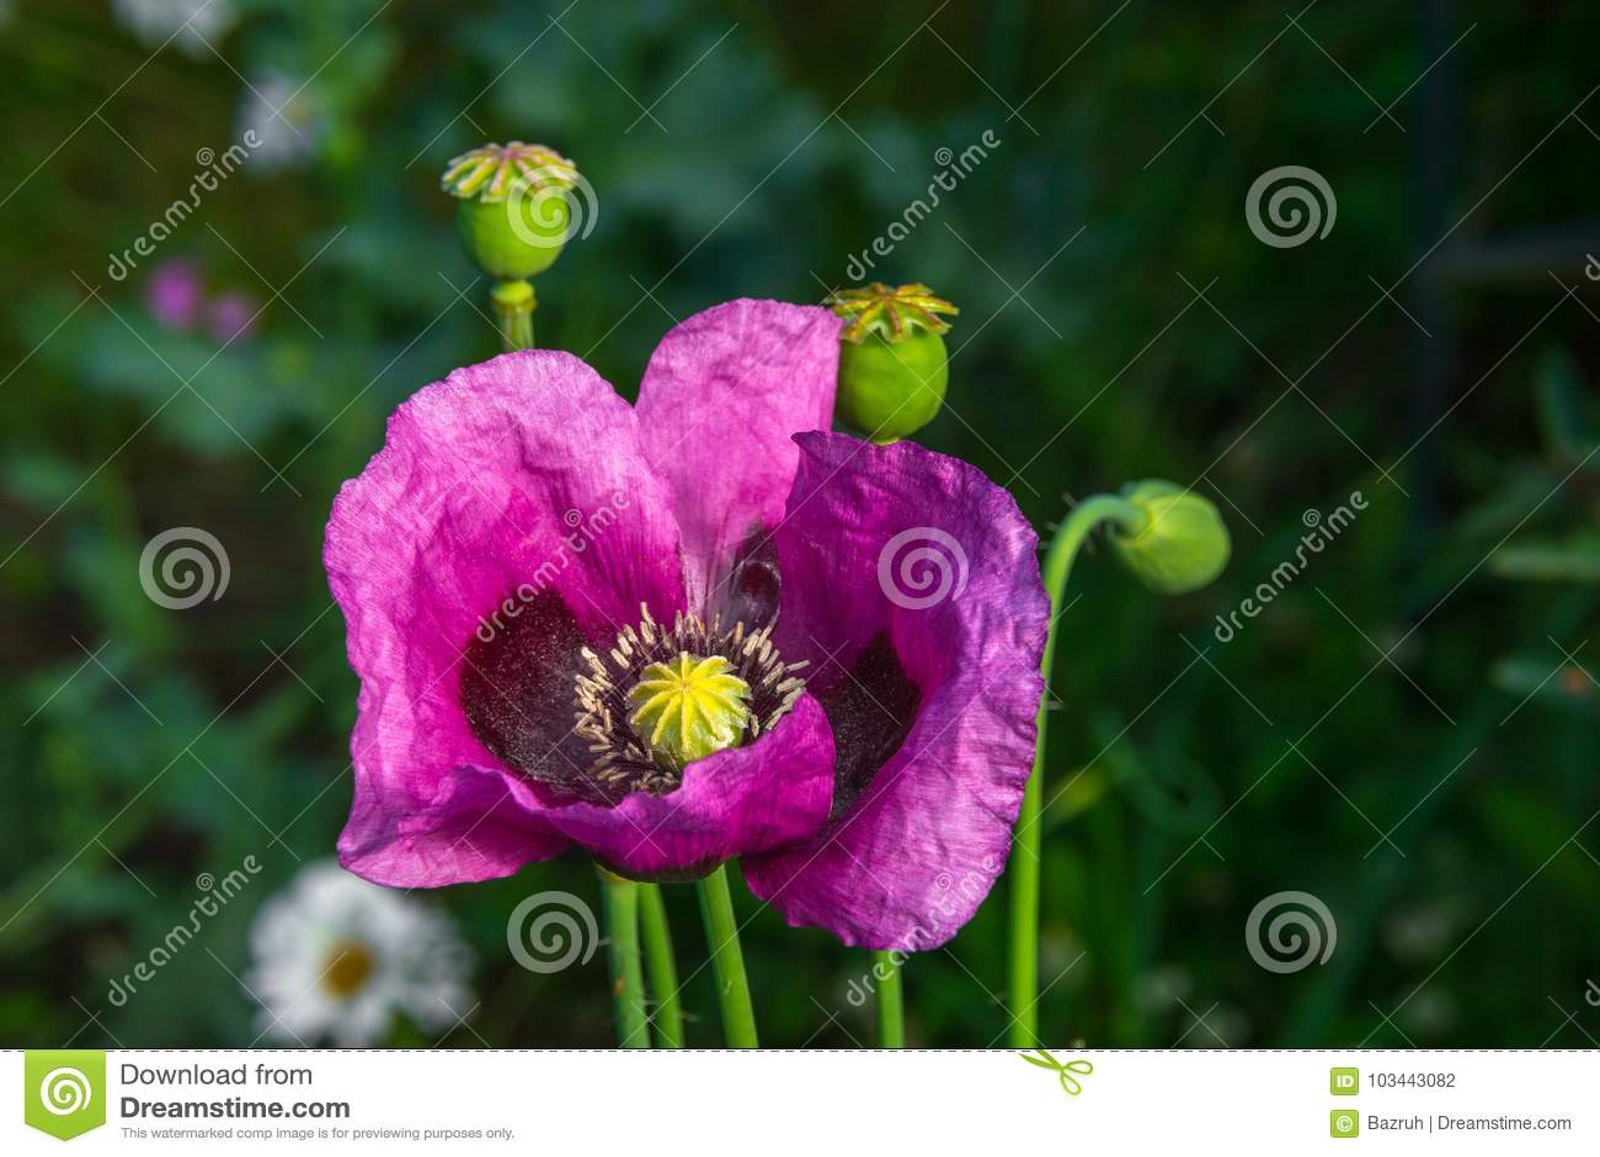 Opium Poppy Flower Stock Photo Image Of Addiction Bloom 103443082